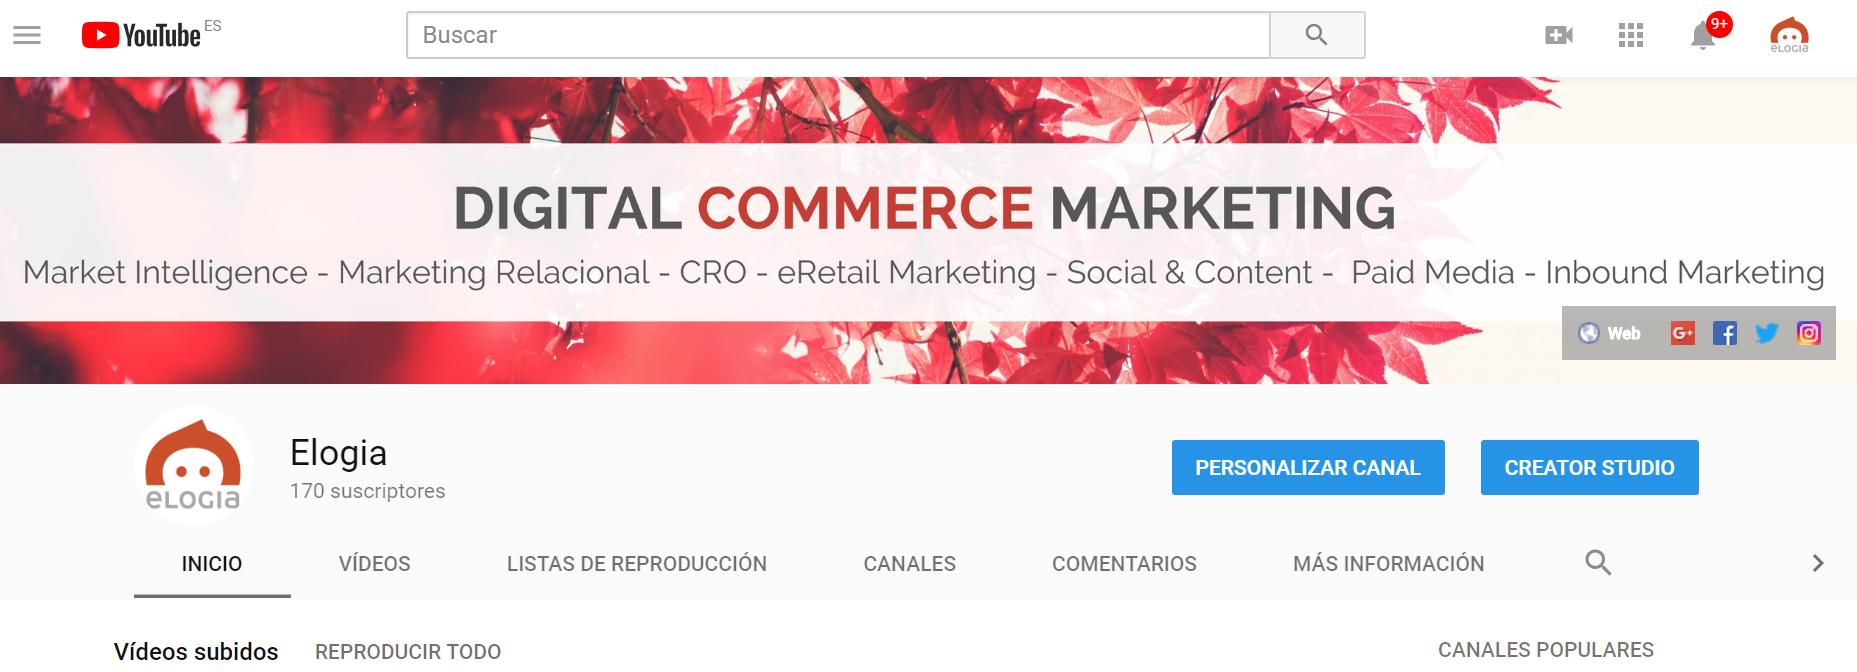 optimizar-canal-youtube-cabecera